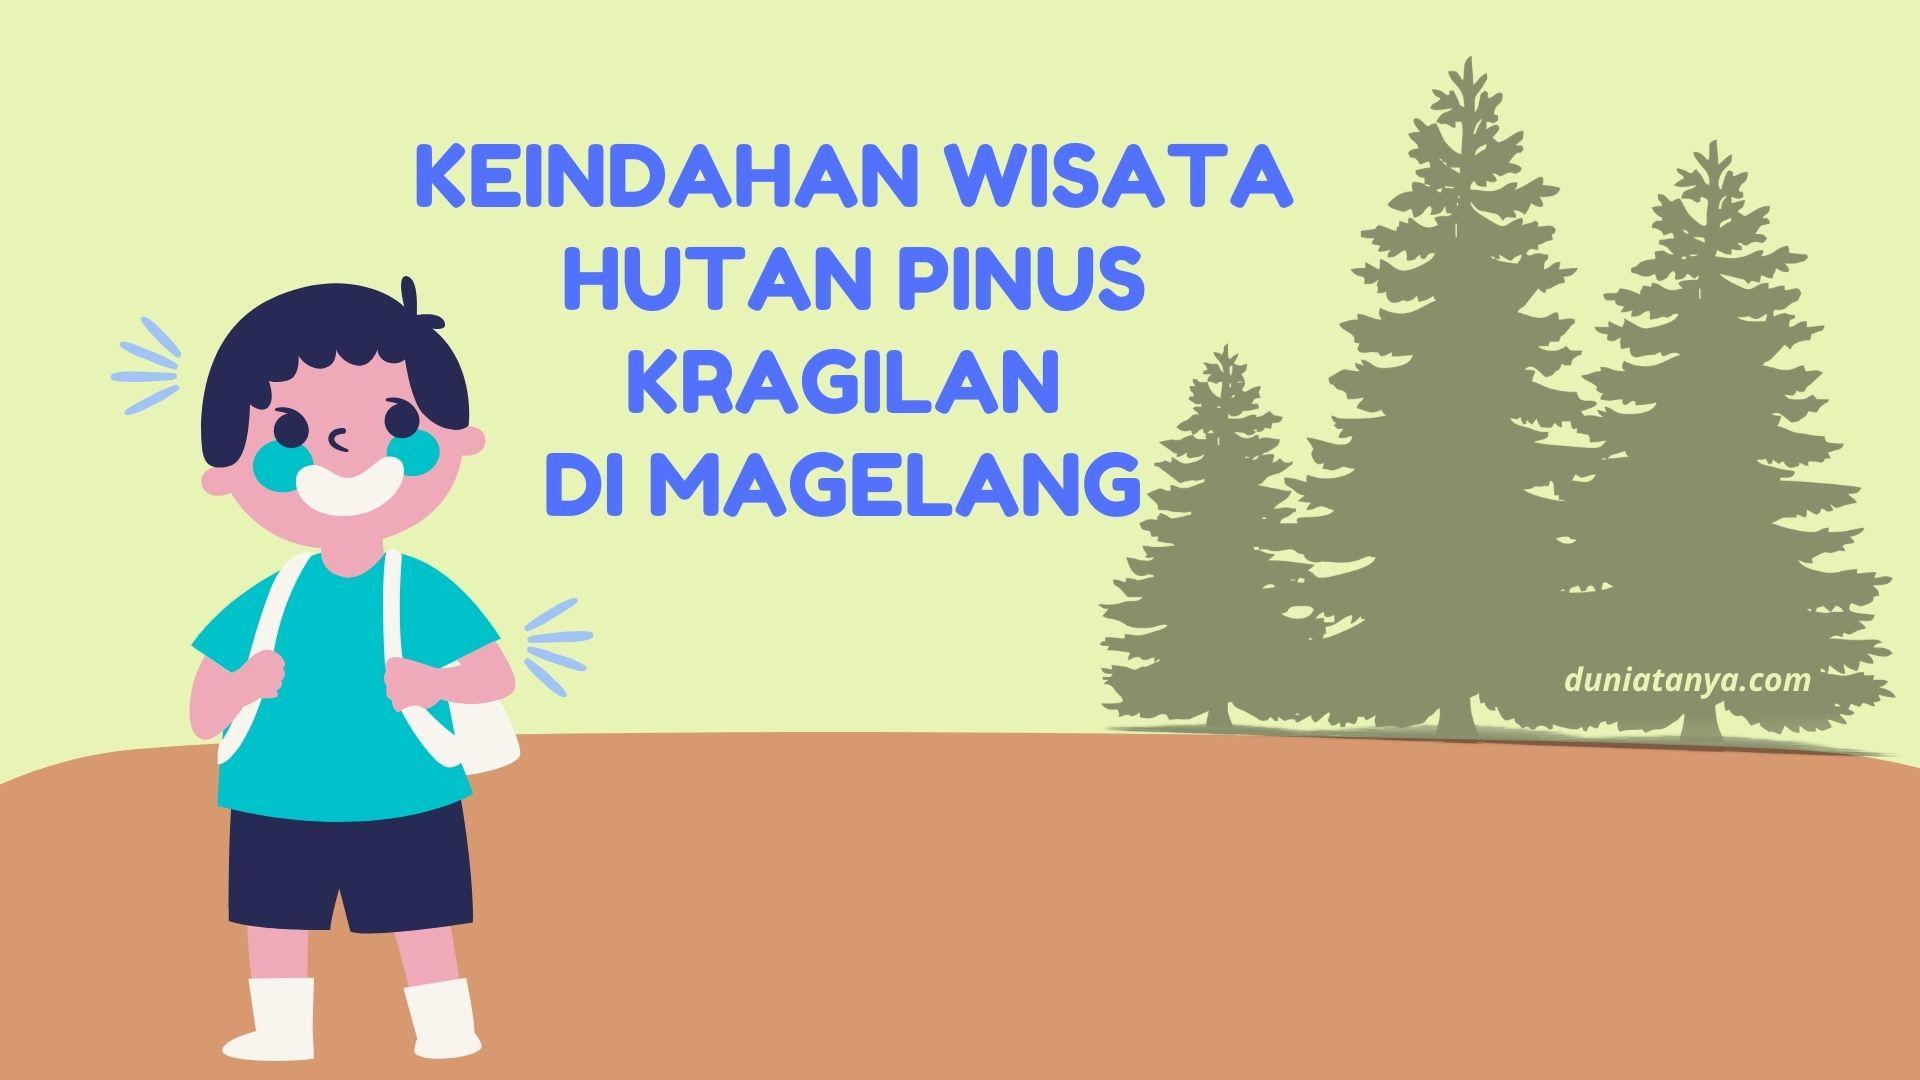 You are currently viewing Keindahan Wisata Hutan Pinus Kragilan Di Magelang